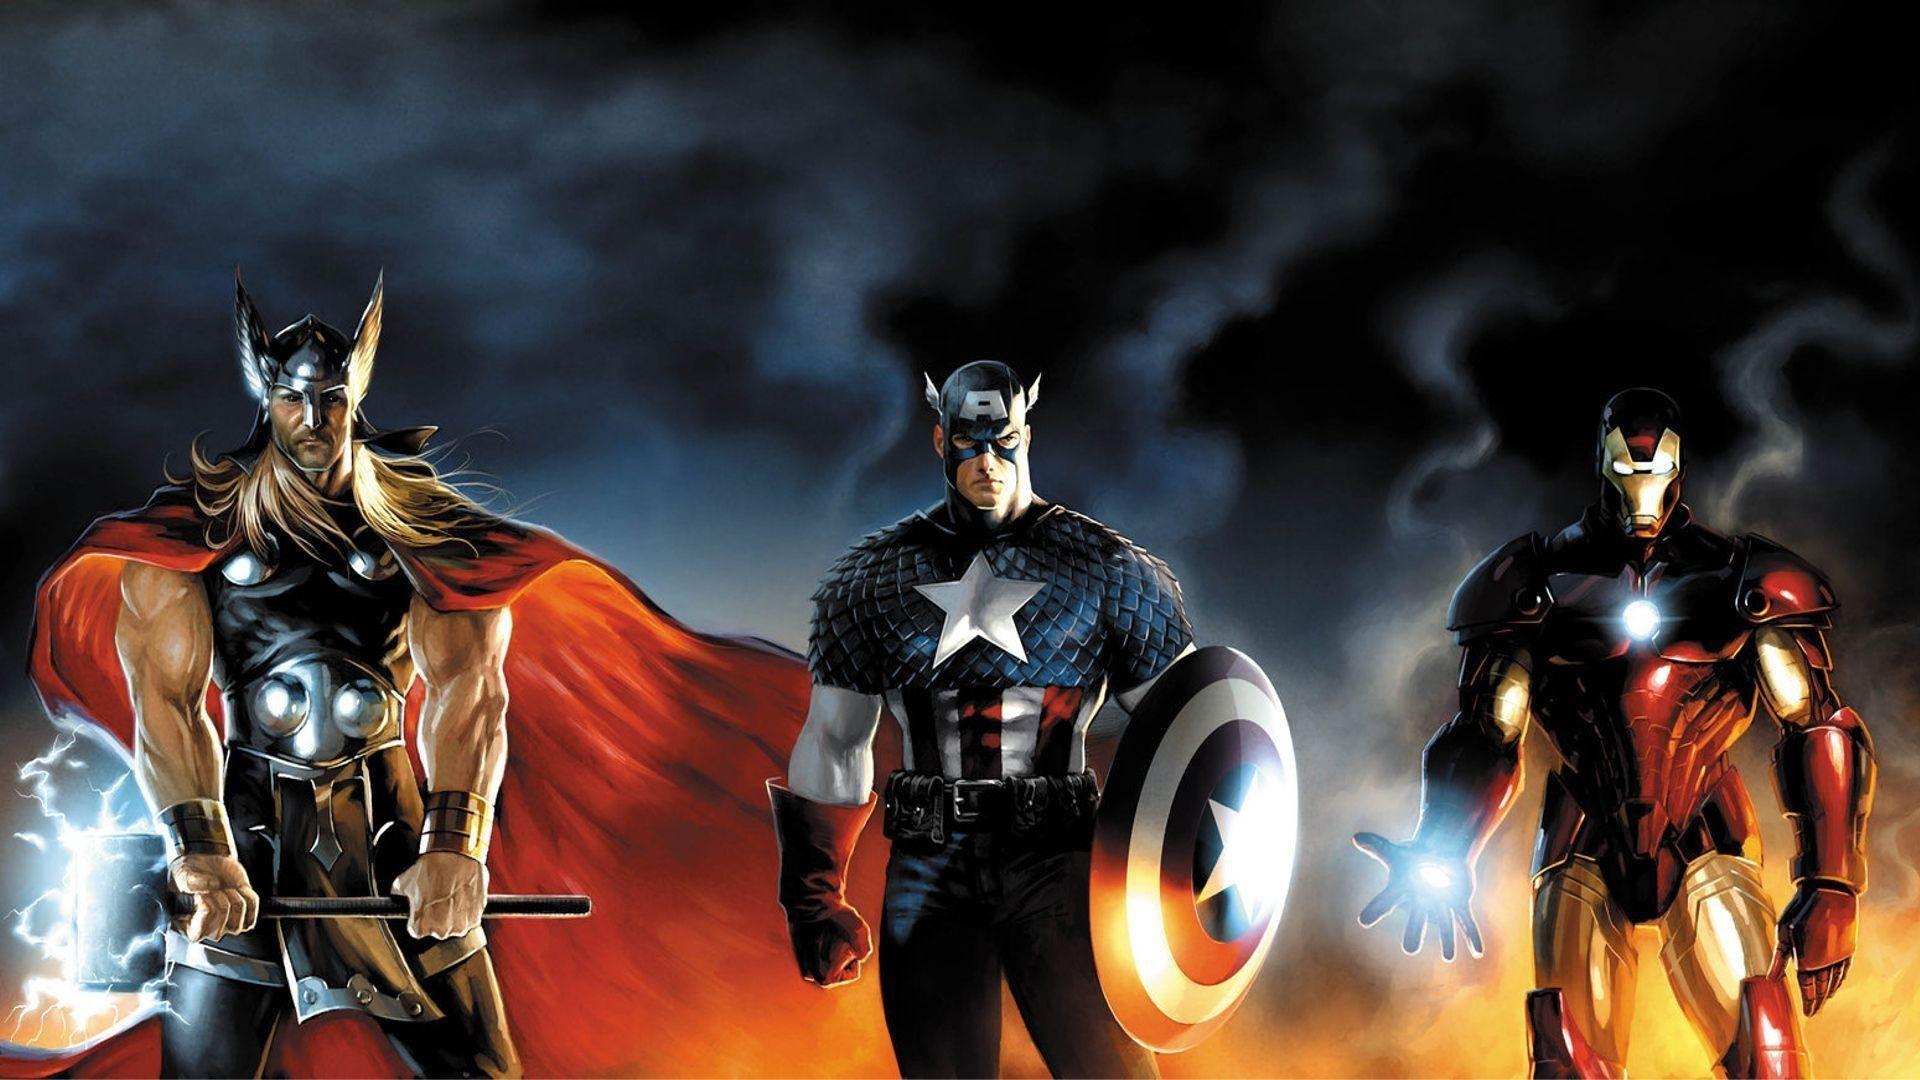 Marvel Heroes Wallpapers Top Free Marvel Heroes Backgrounds